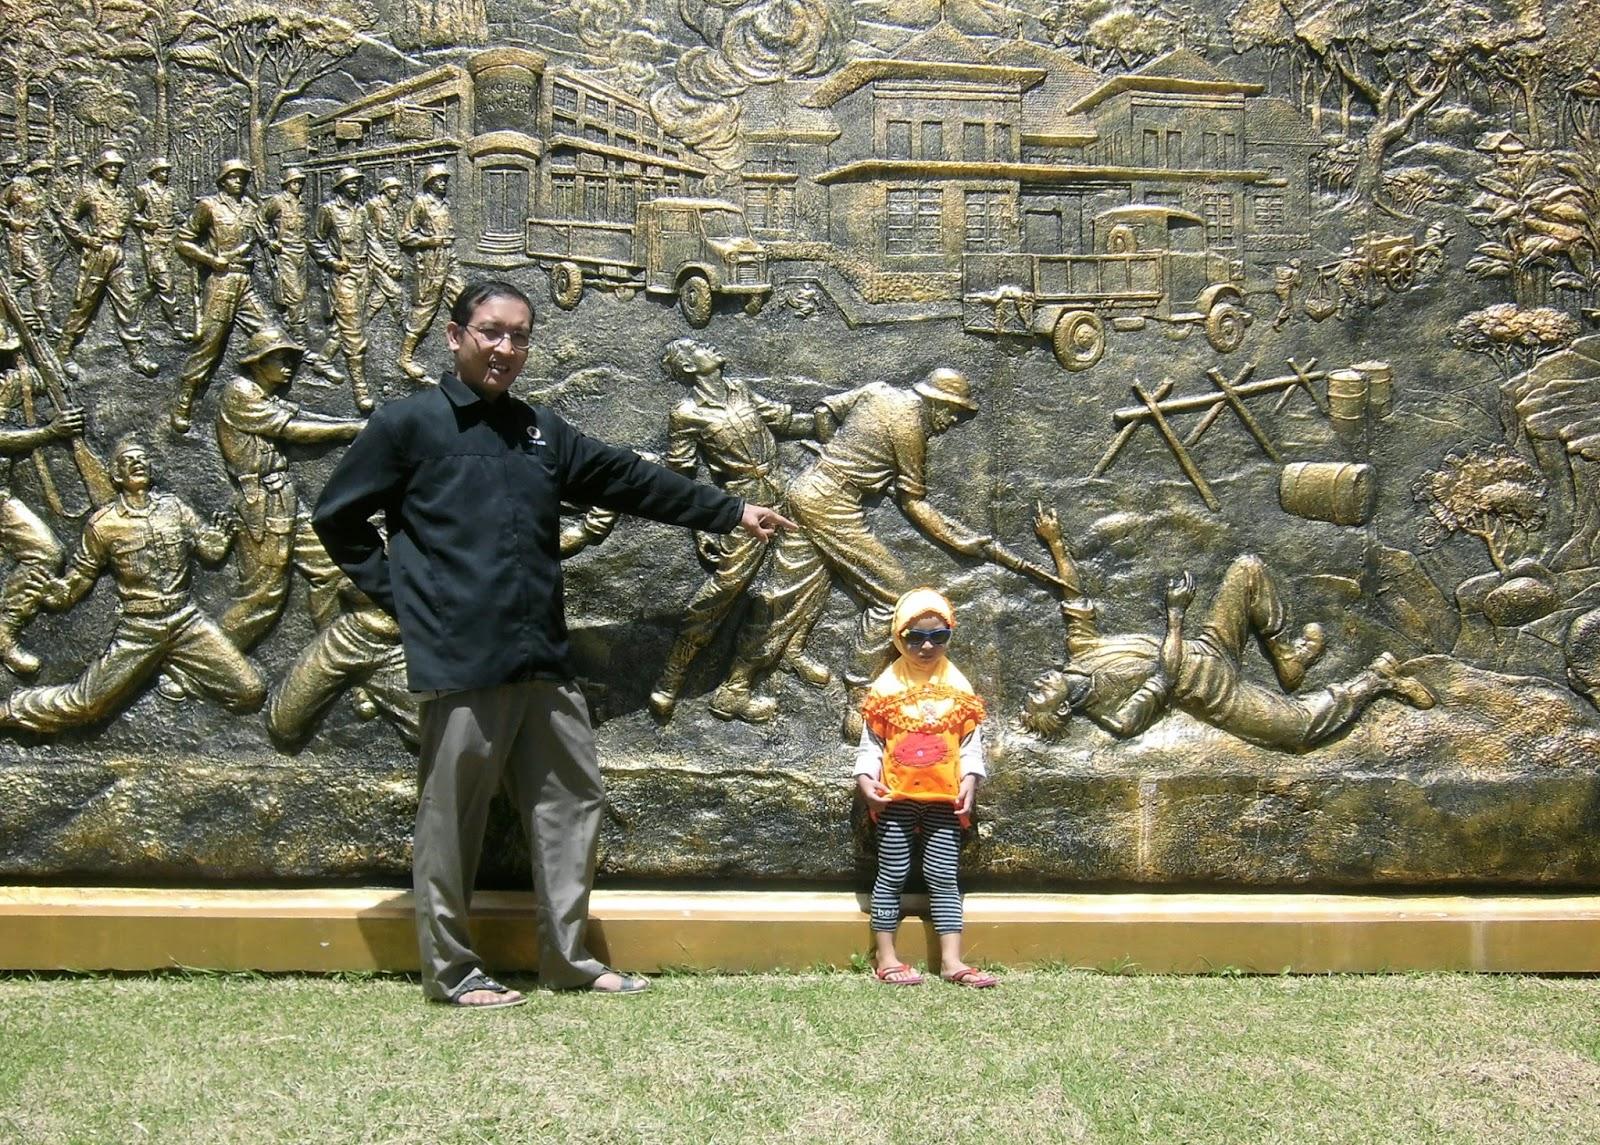 Firdaus Ubaidillah Agustus 2013 Halaman Depan Museum Mandala Wangsit Siliwangi